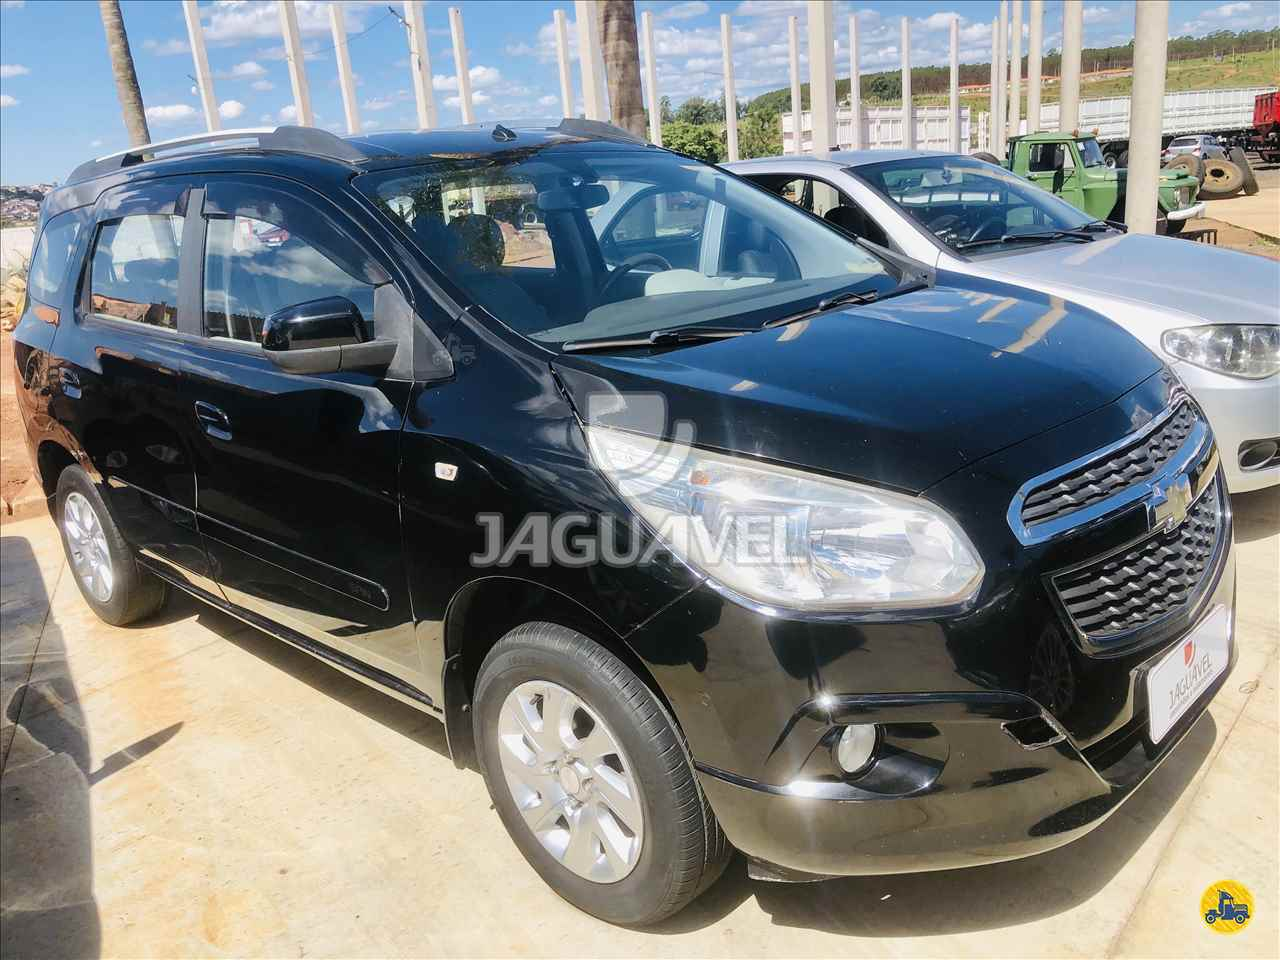 CARRO GM - Chevrolet Spin 1.8 LTZ Jaguavel Caminhões JAGUARIAIVA PARANÁ PR